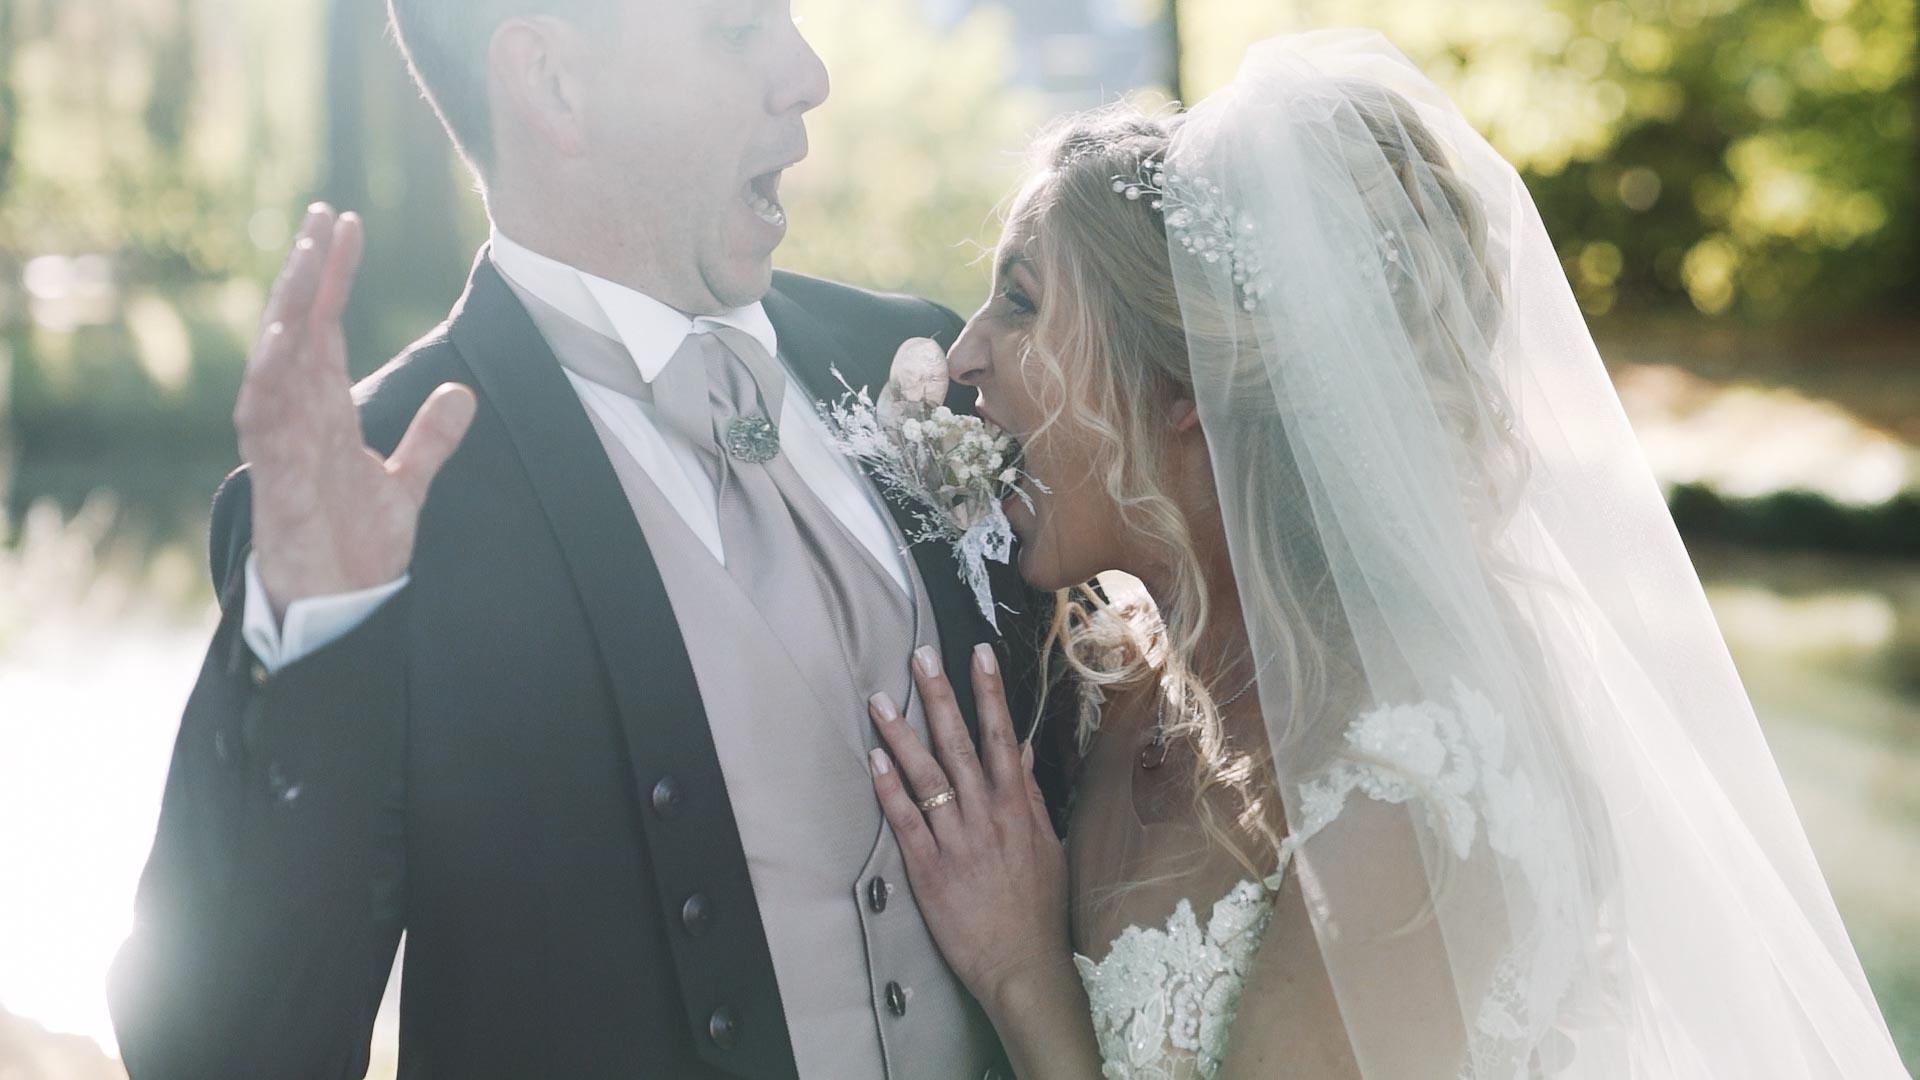 Pascal & Jenny Hochzeitsfilm Schloss Vettelhoven Videograf Hochzeit Filmemacher 056